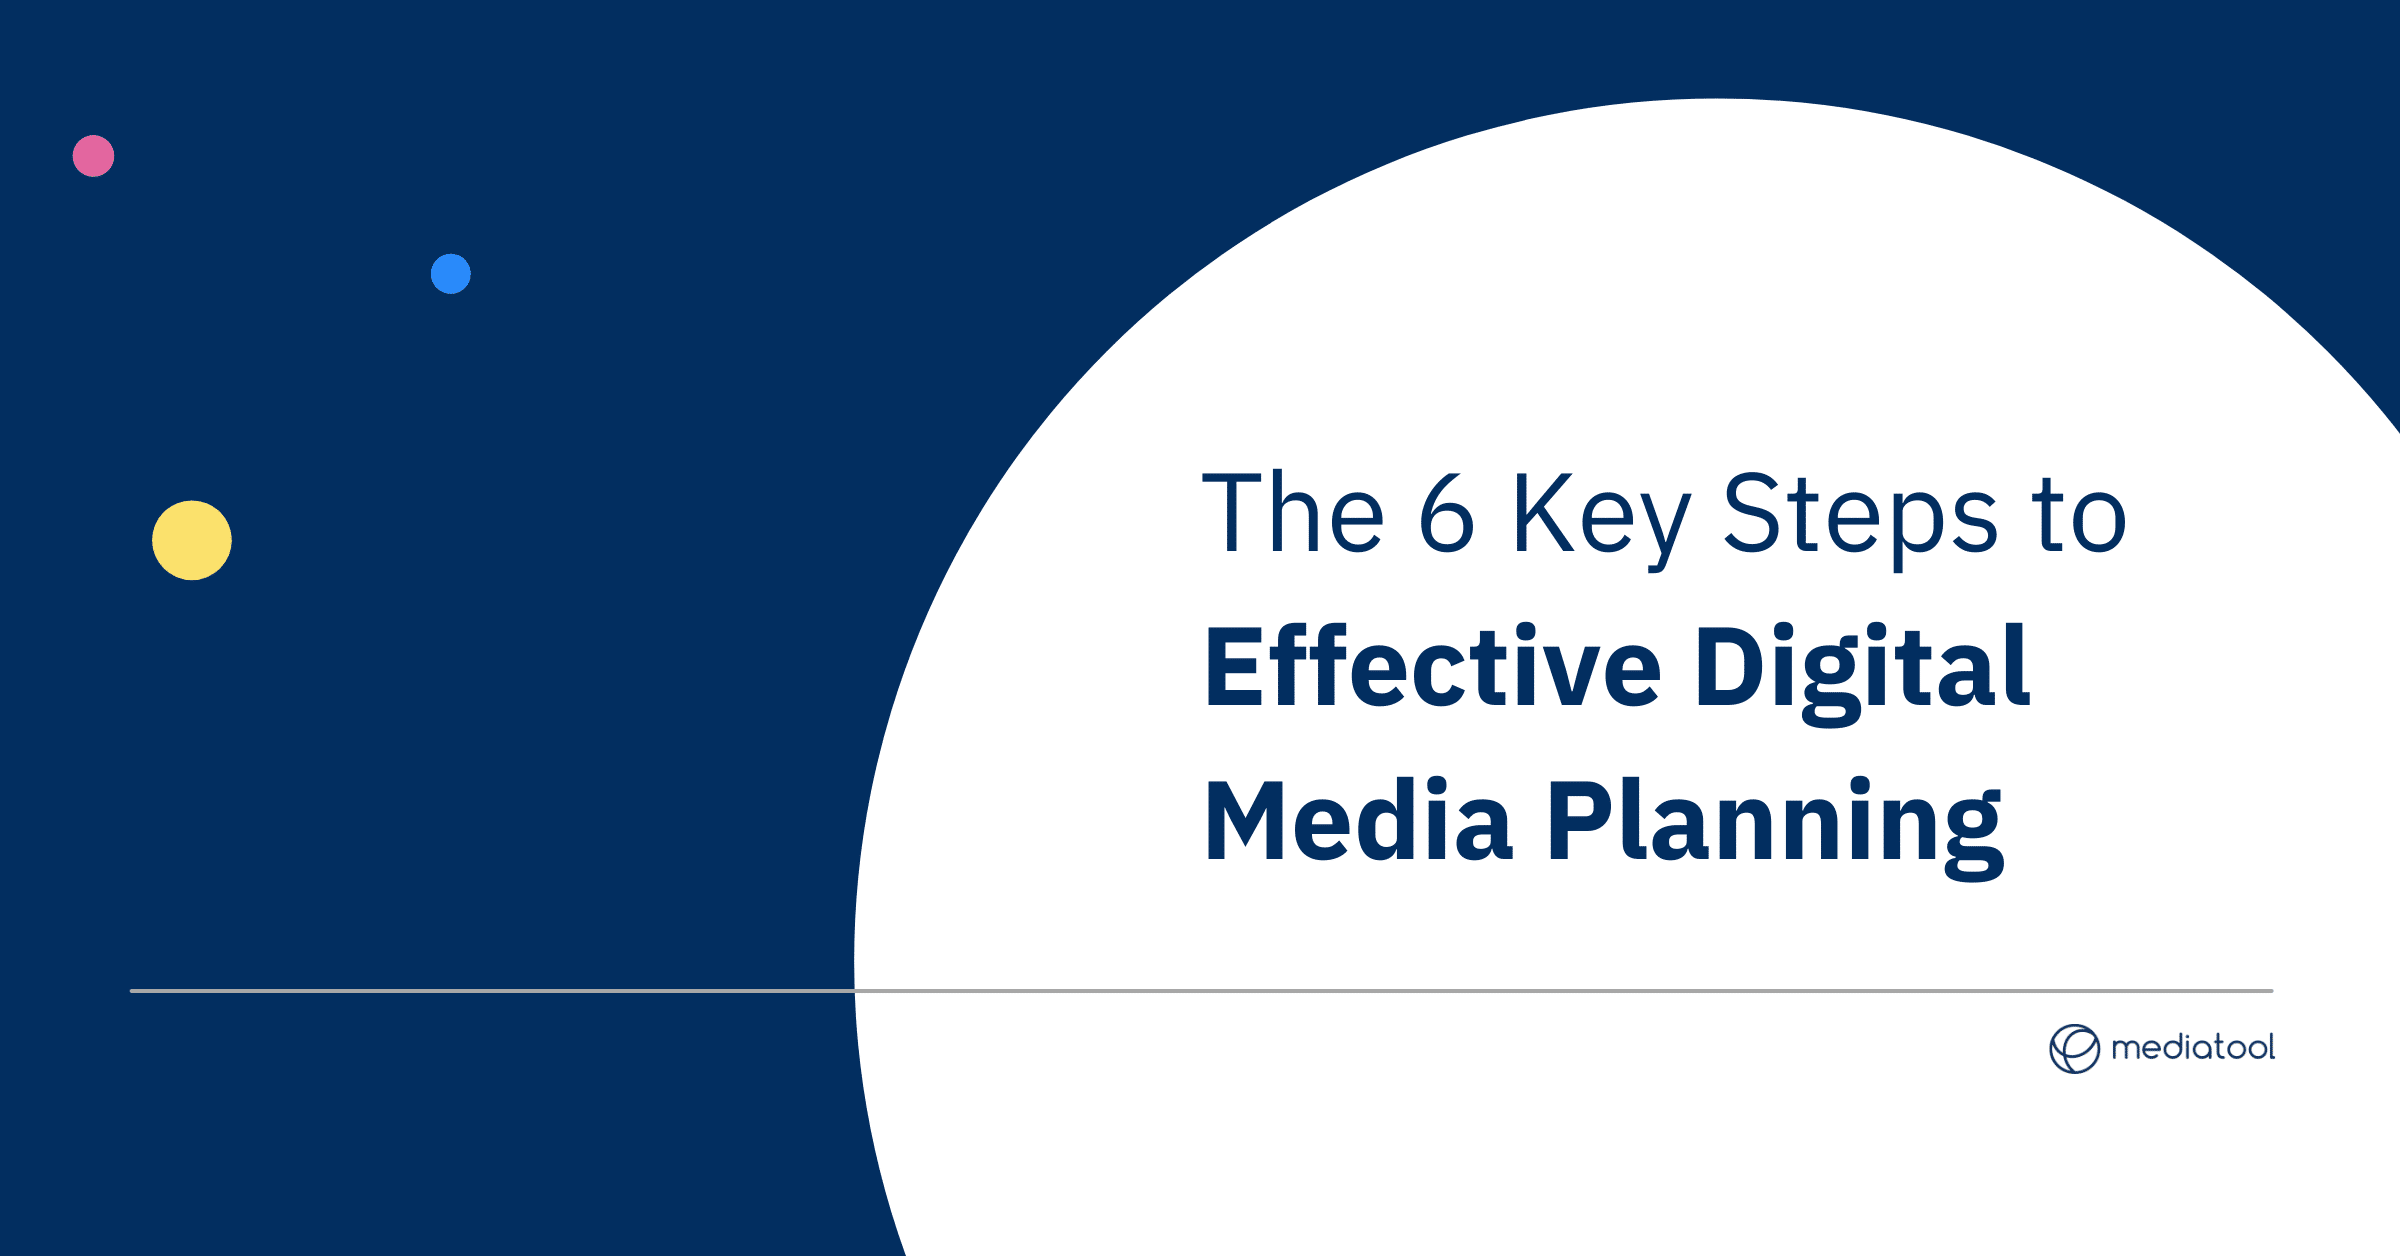 The six key steps to effective digital media planning